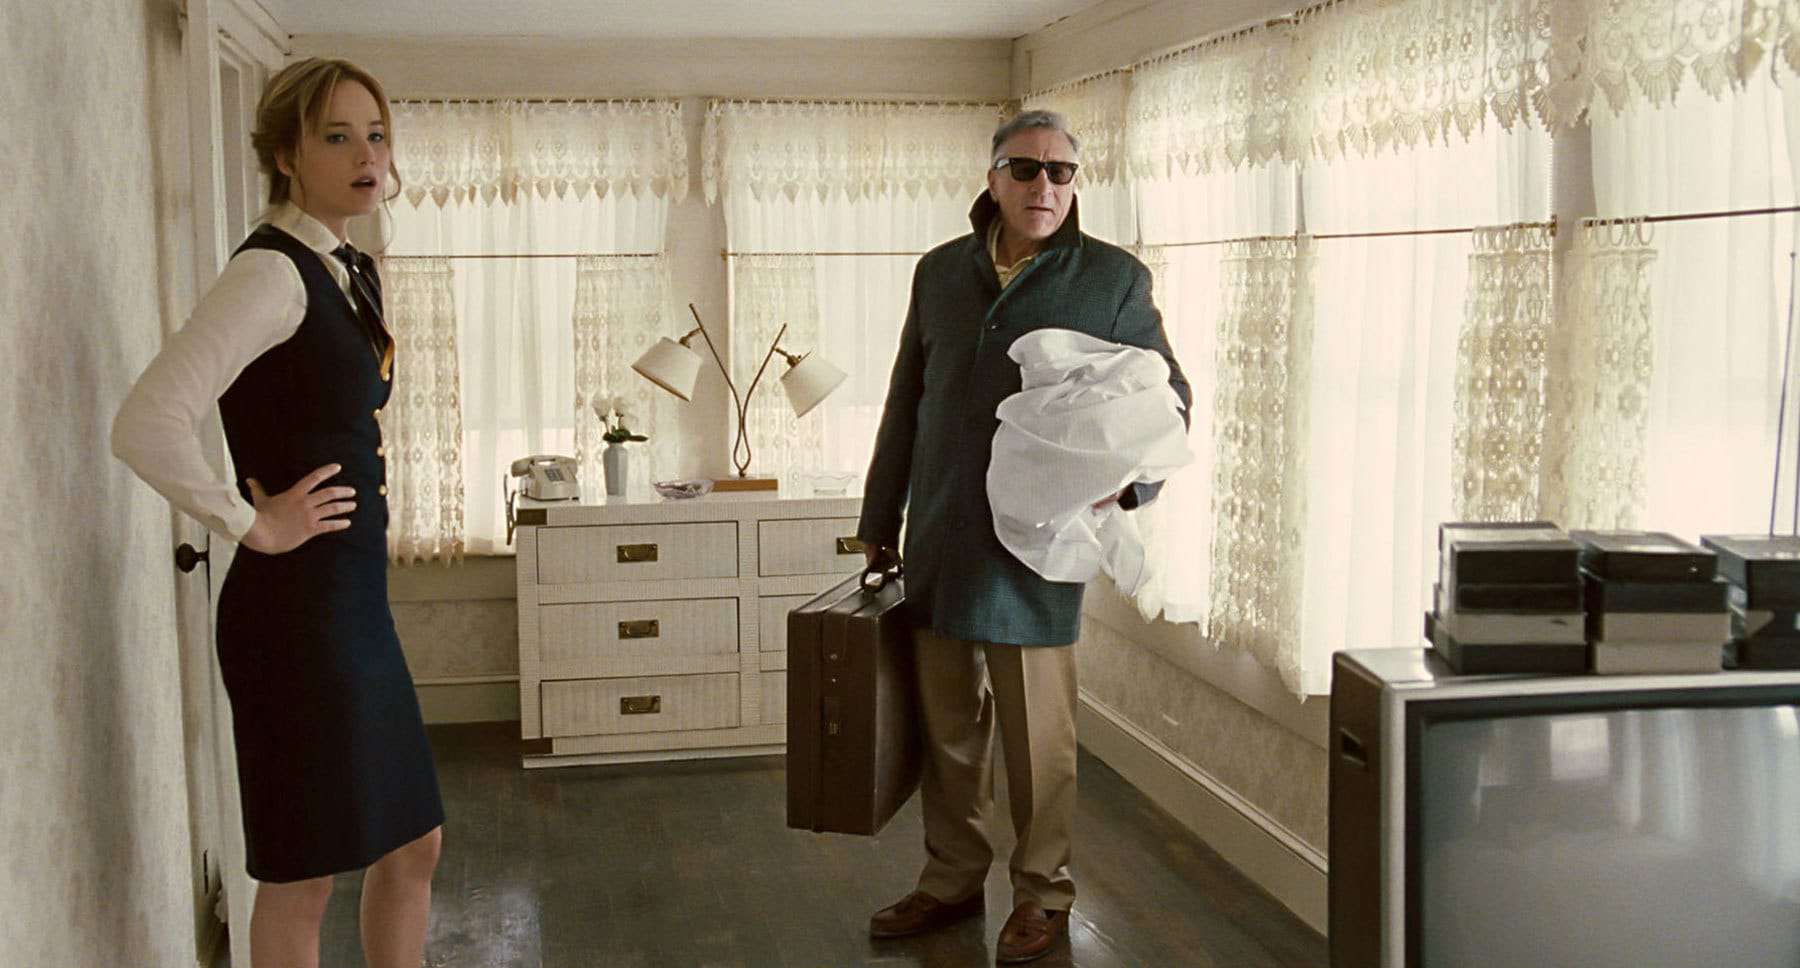 Jennifer Lawrence and Robert De Niro in the movie Joy